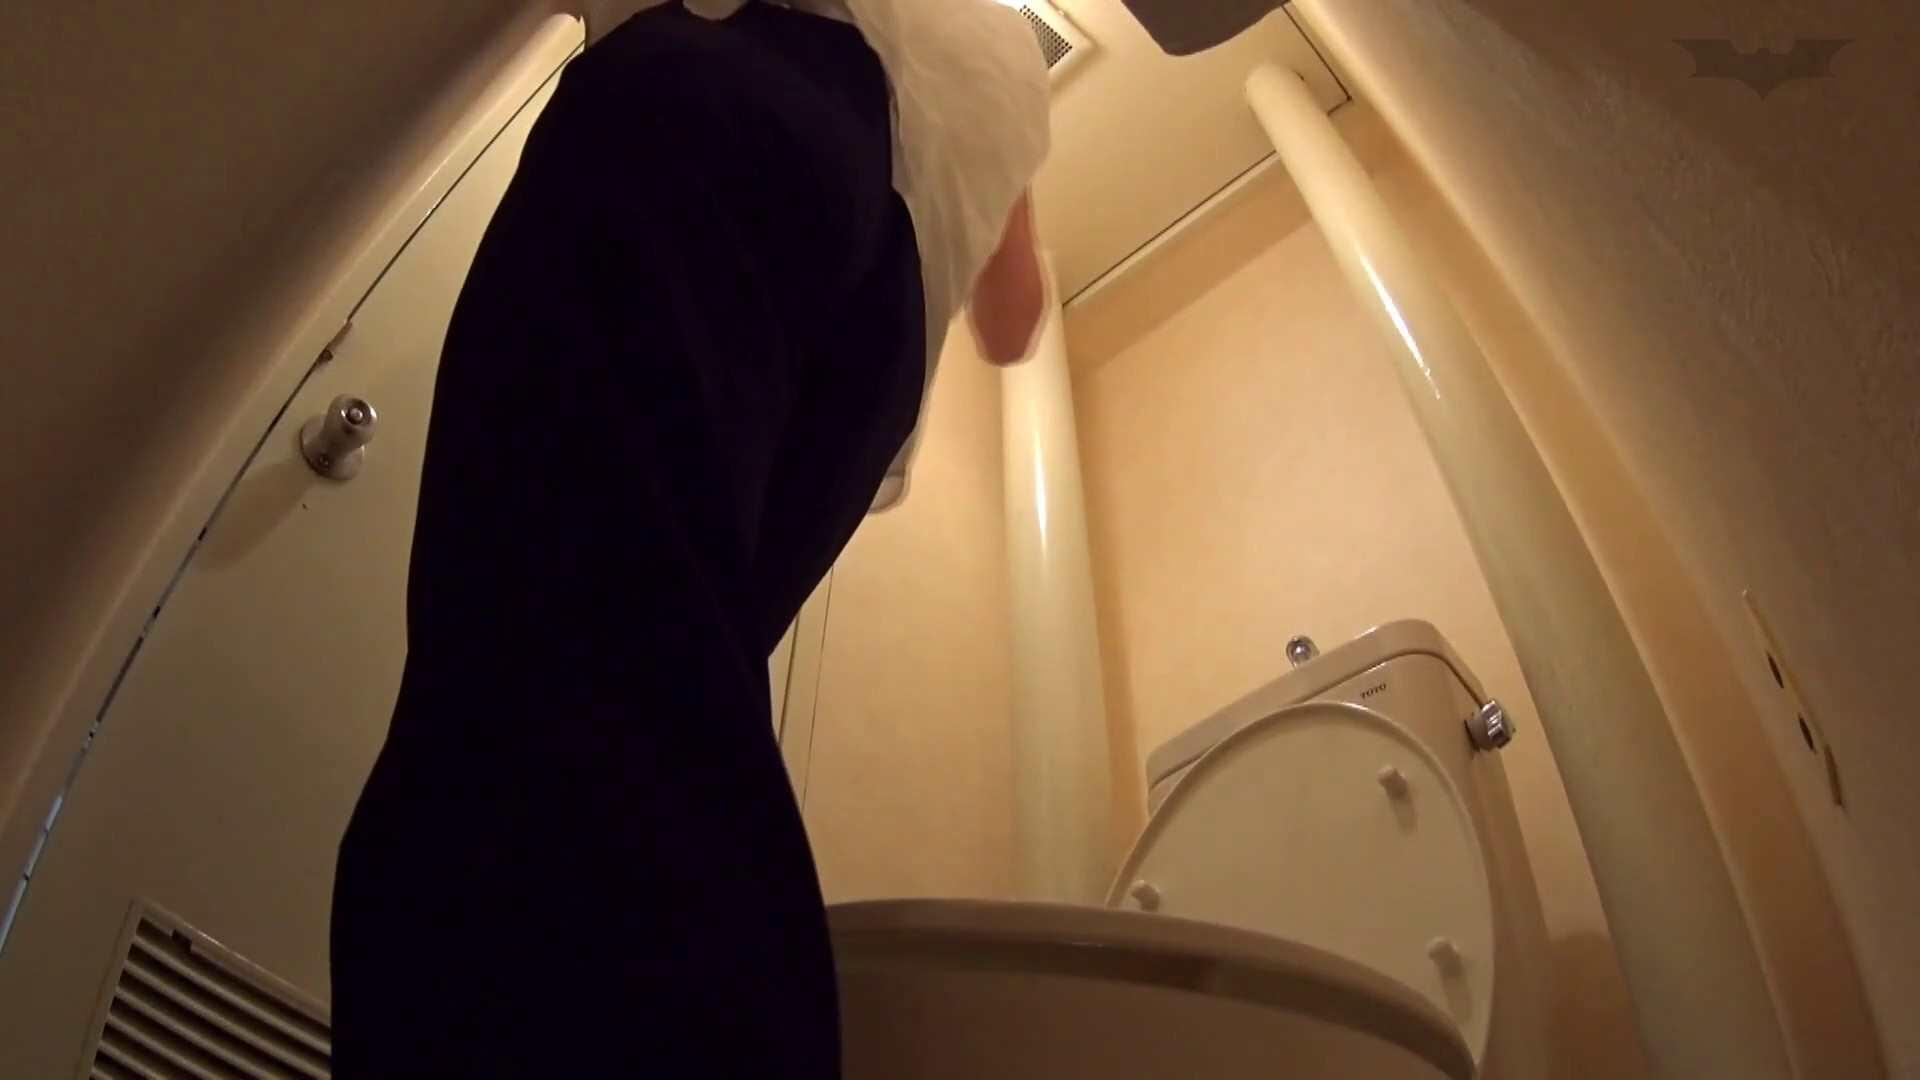 vol.04[洗面所]実はコレが目的でした。-脱糞美人お女市さまと巨乳大学生- 美しいモデル 性交動画流出 39連発 34